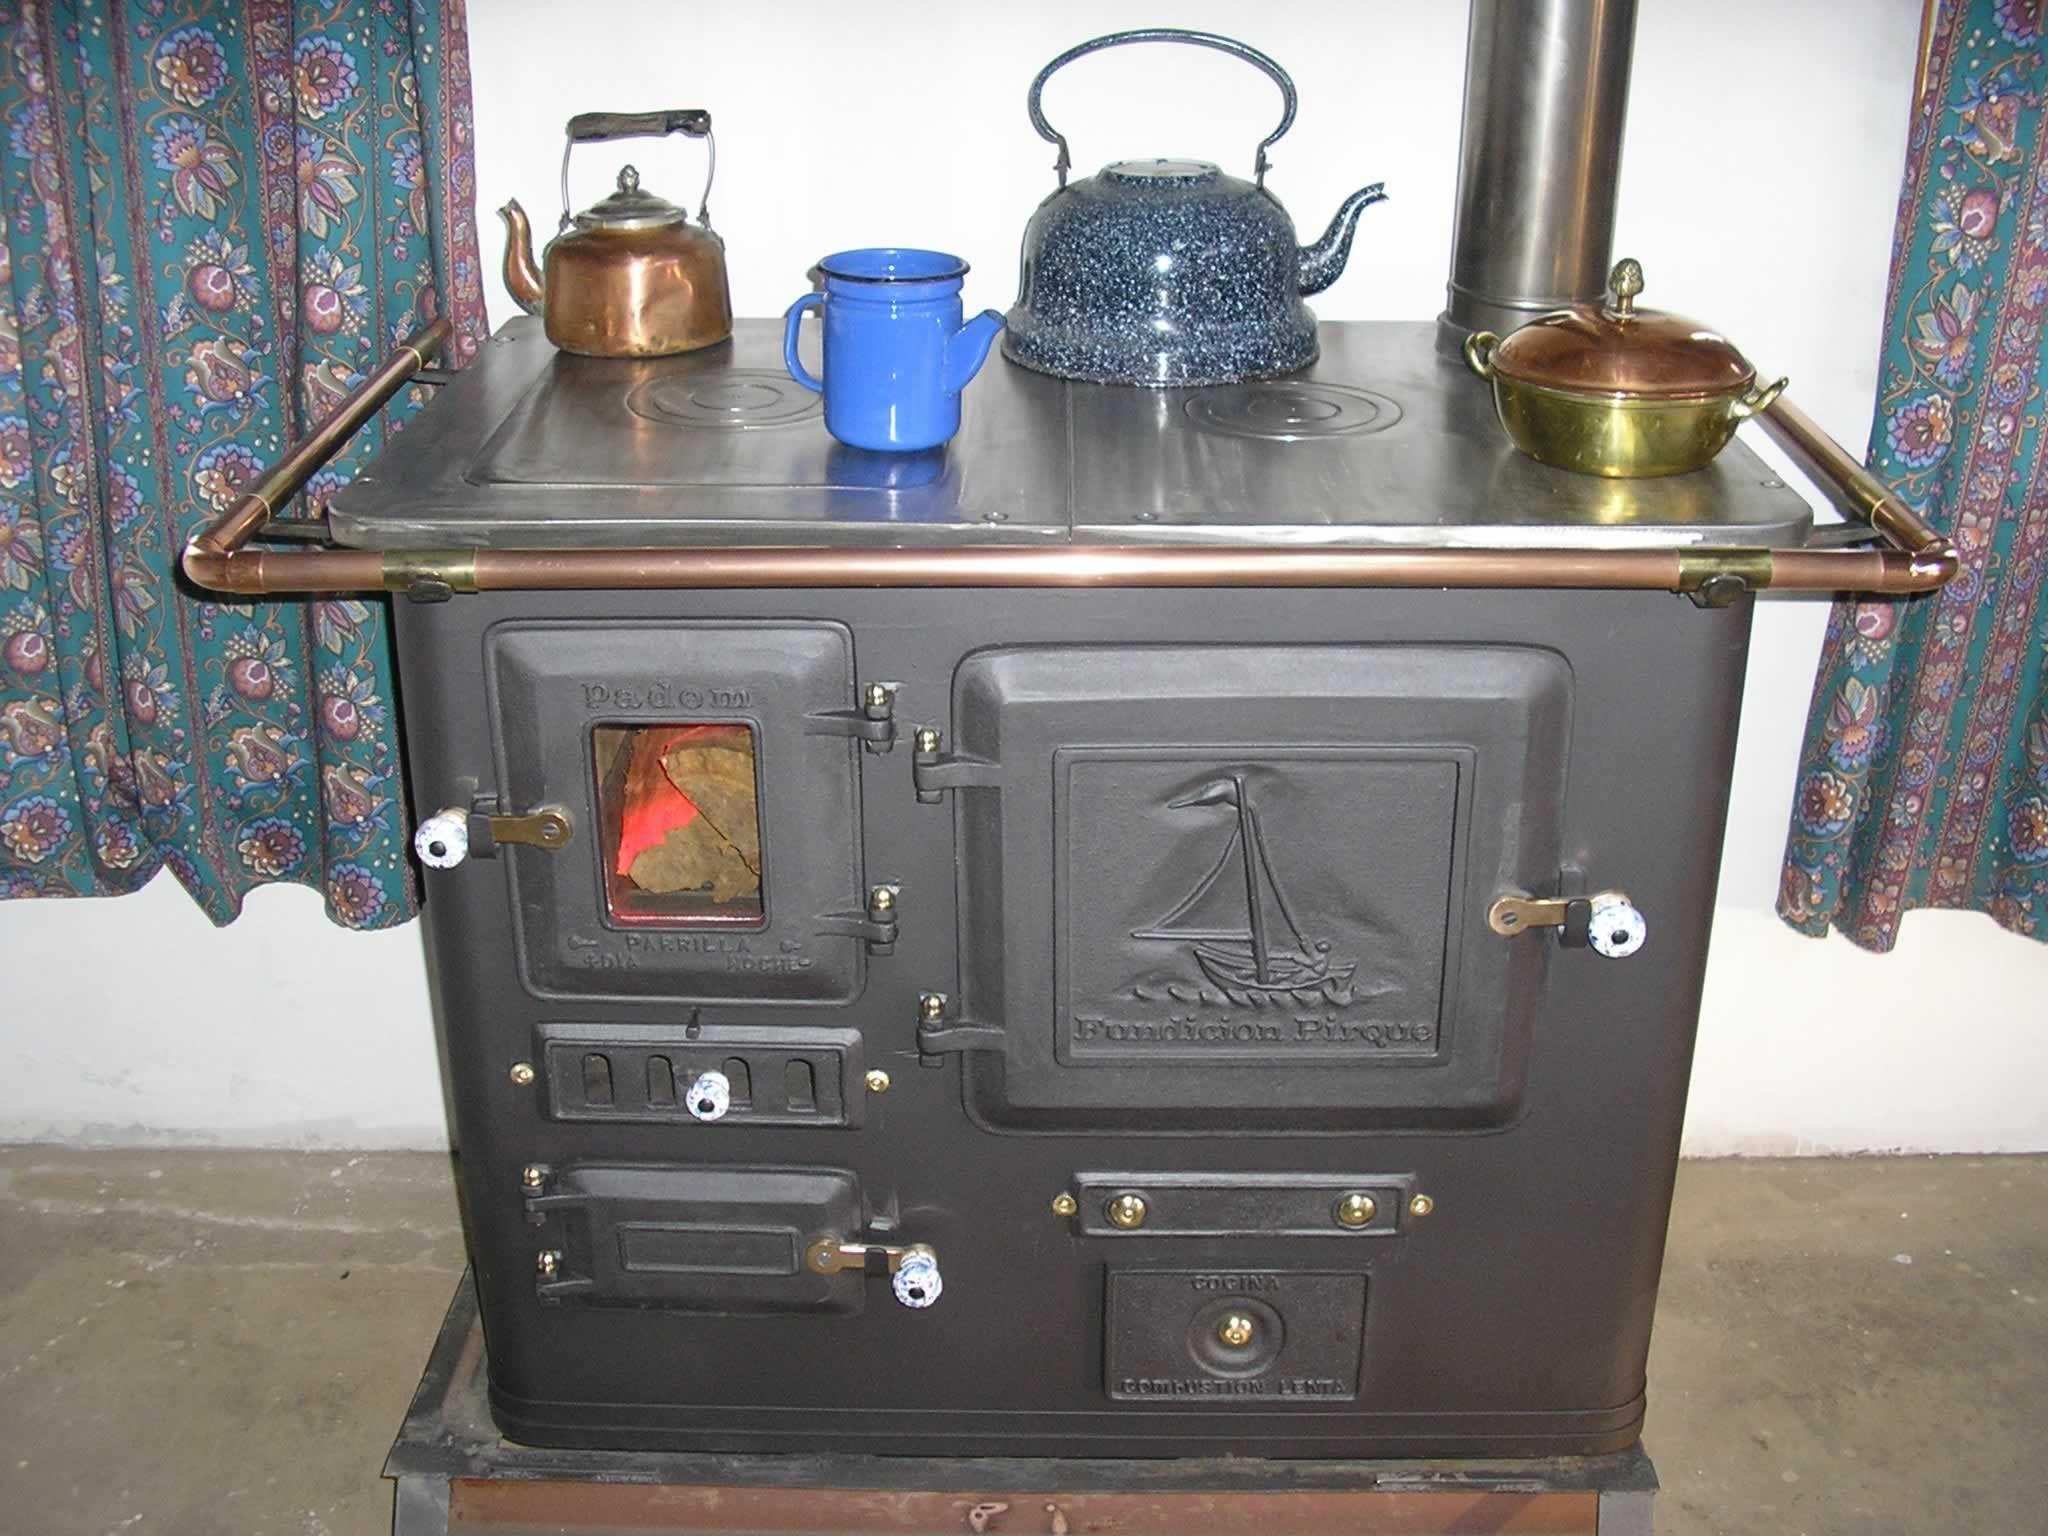 Fundicion Pirque Old Stove Wood Stove Stove Oven